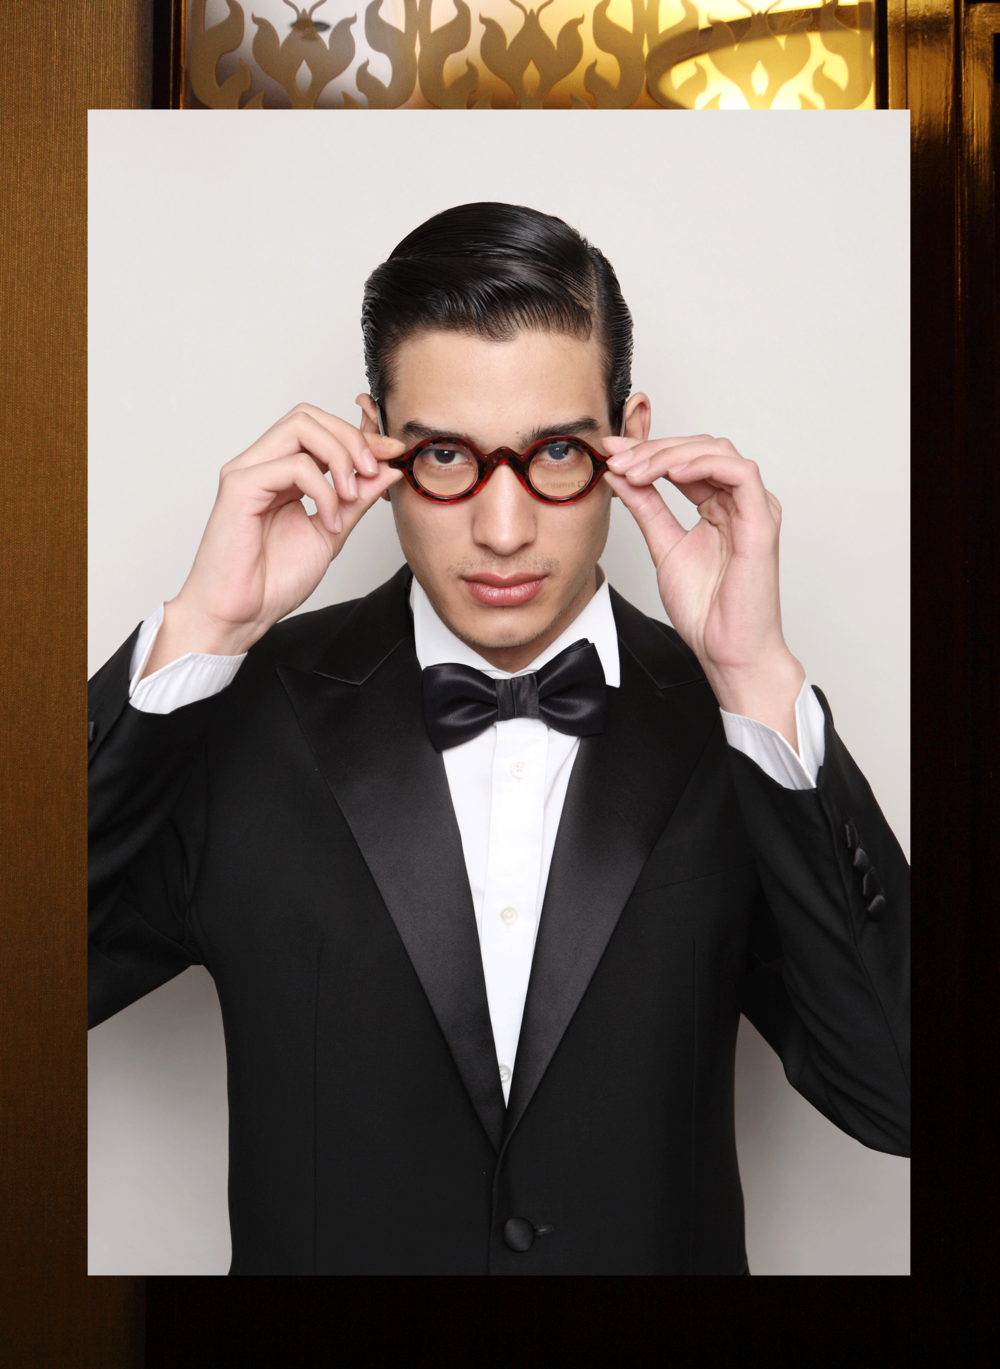 clothes : VVONSUGUNNASIL / eyeglasses : Blake Kuwahara